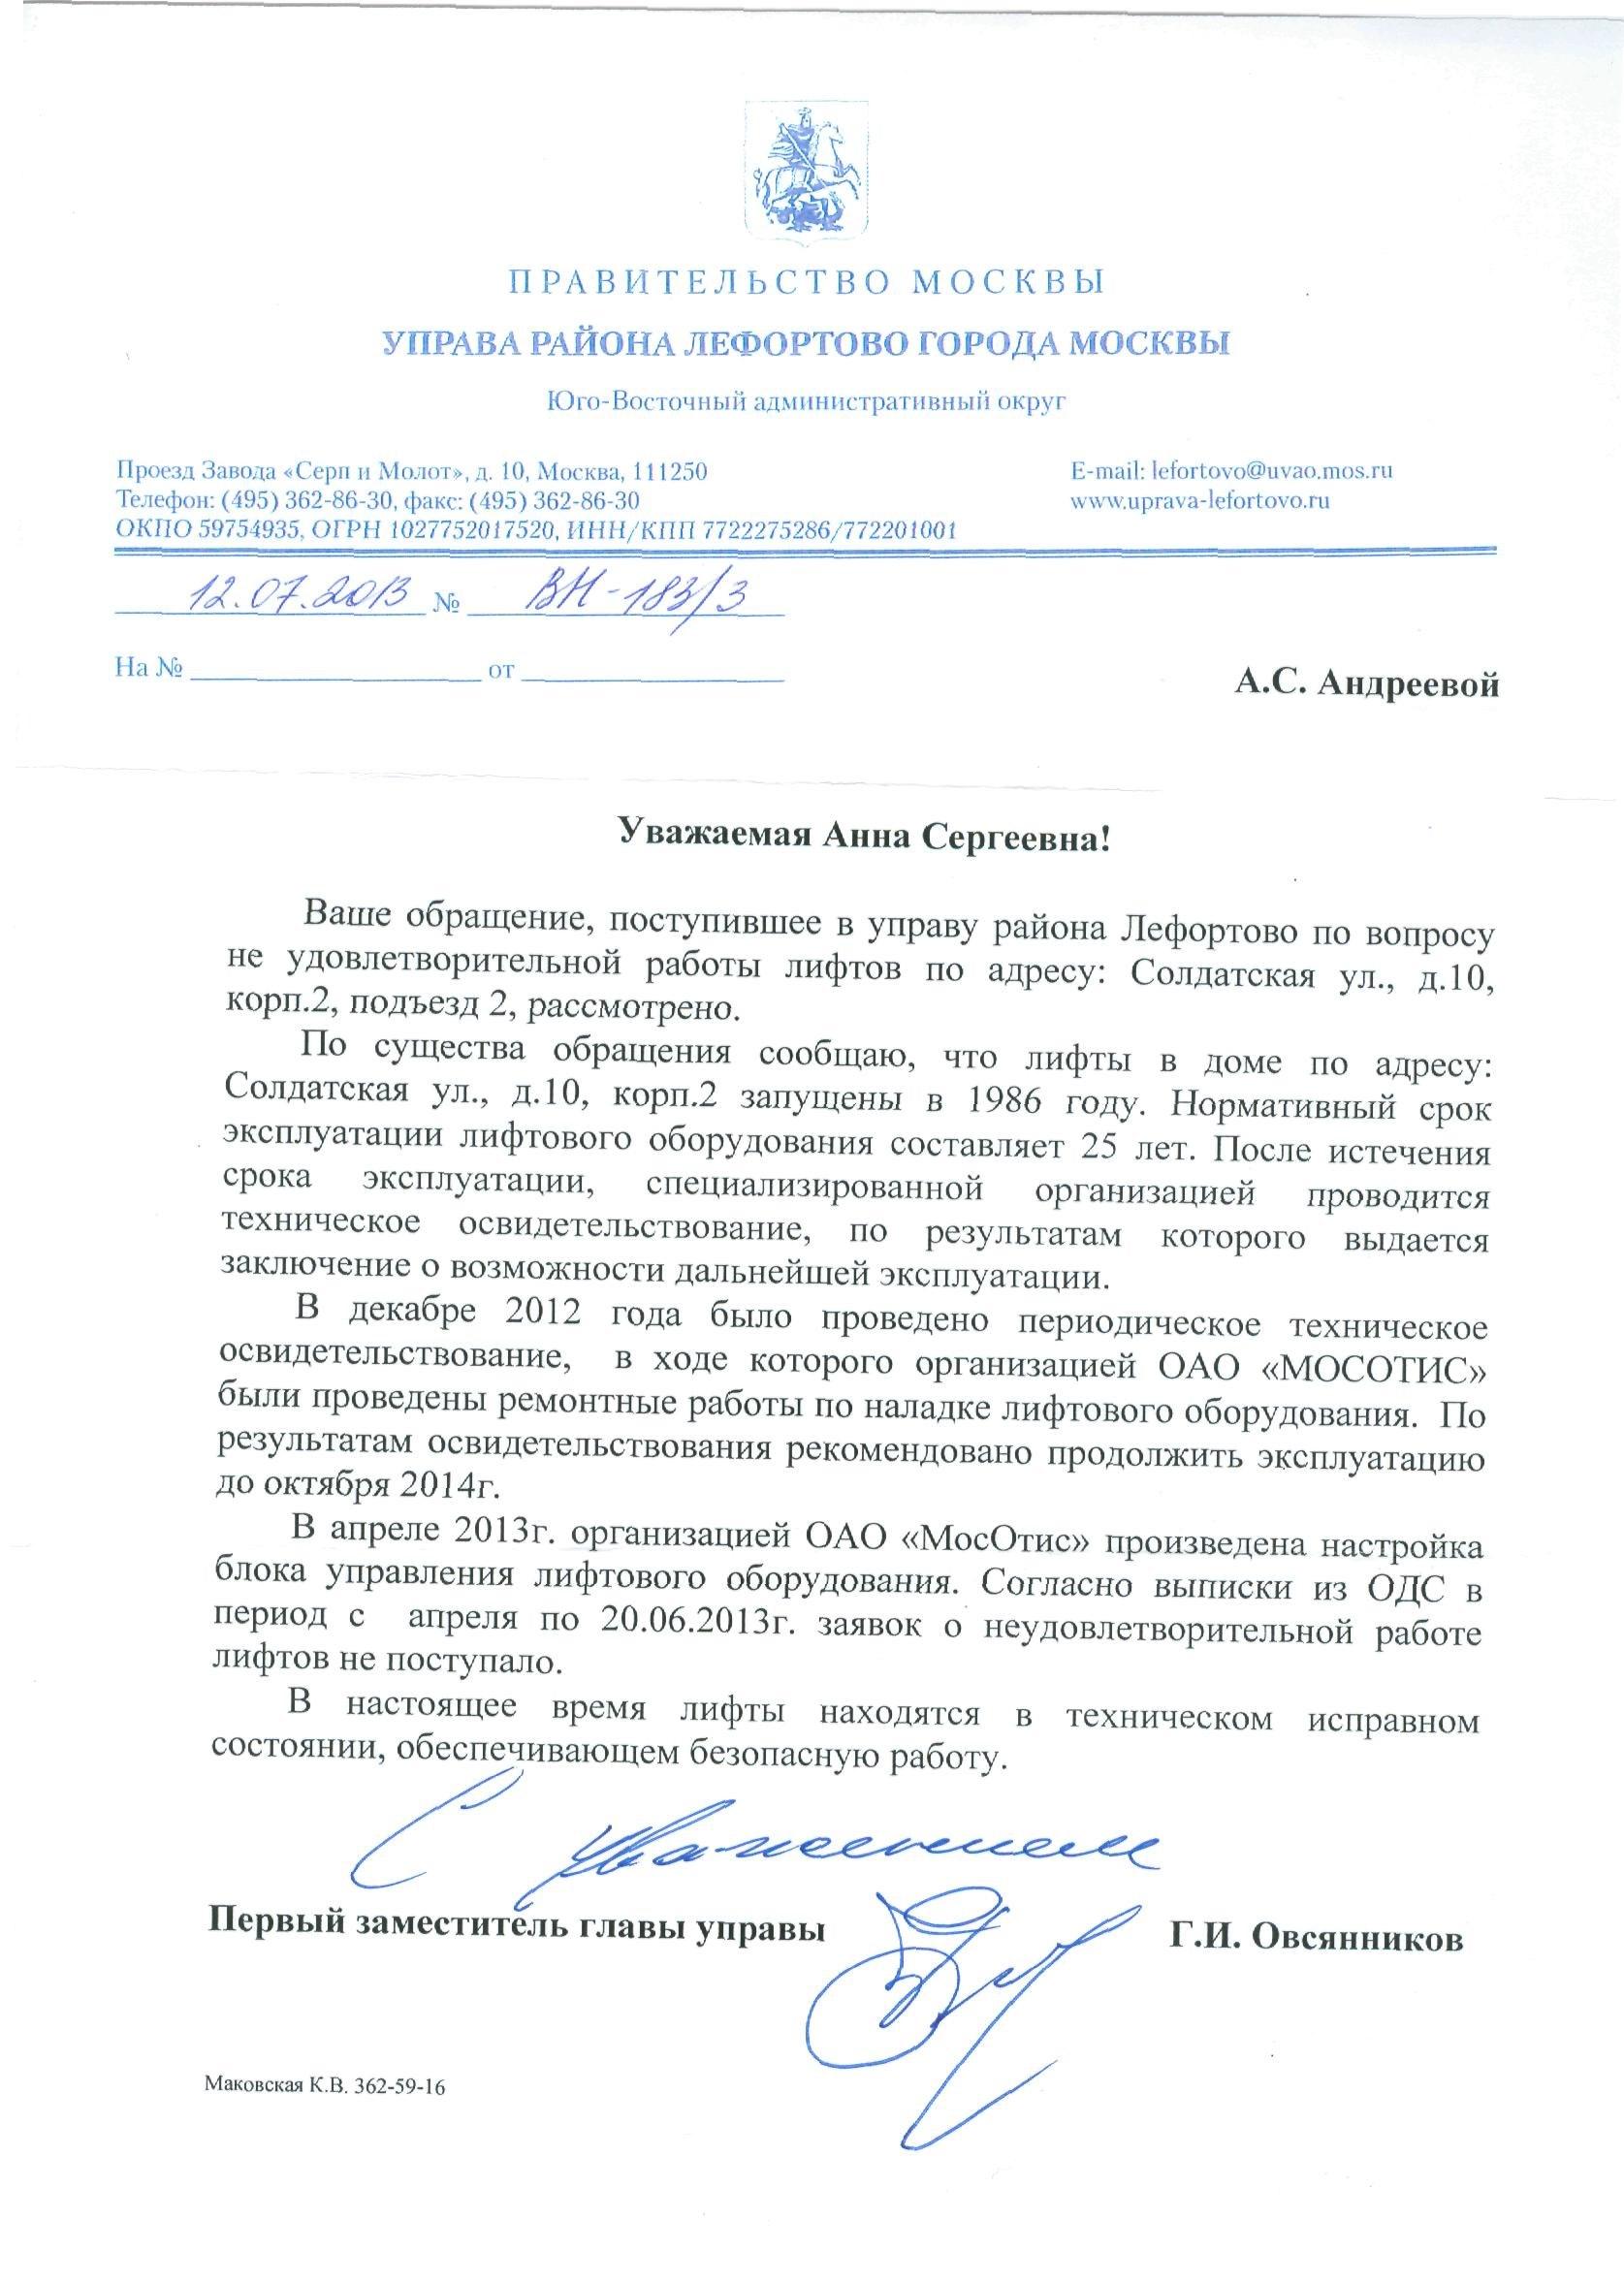 2013.07.12_управа_без адреса